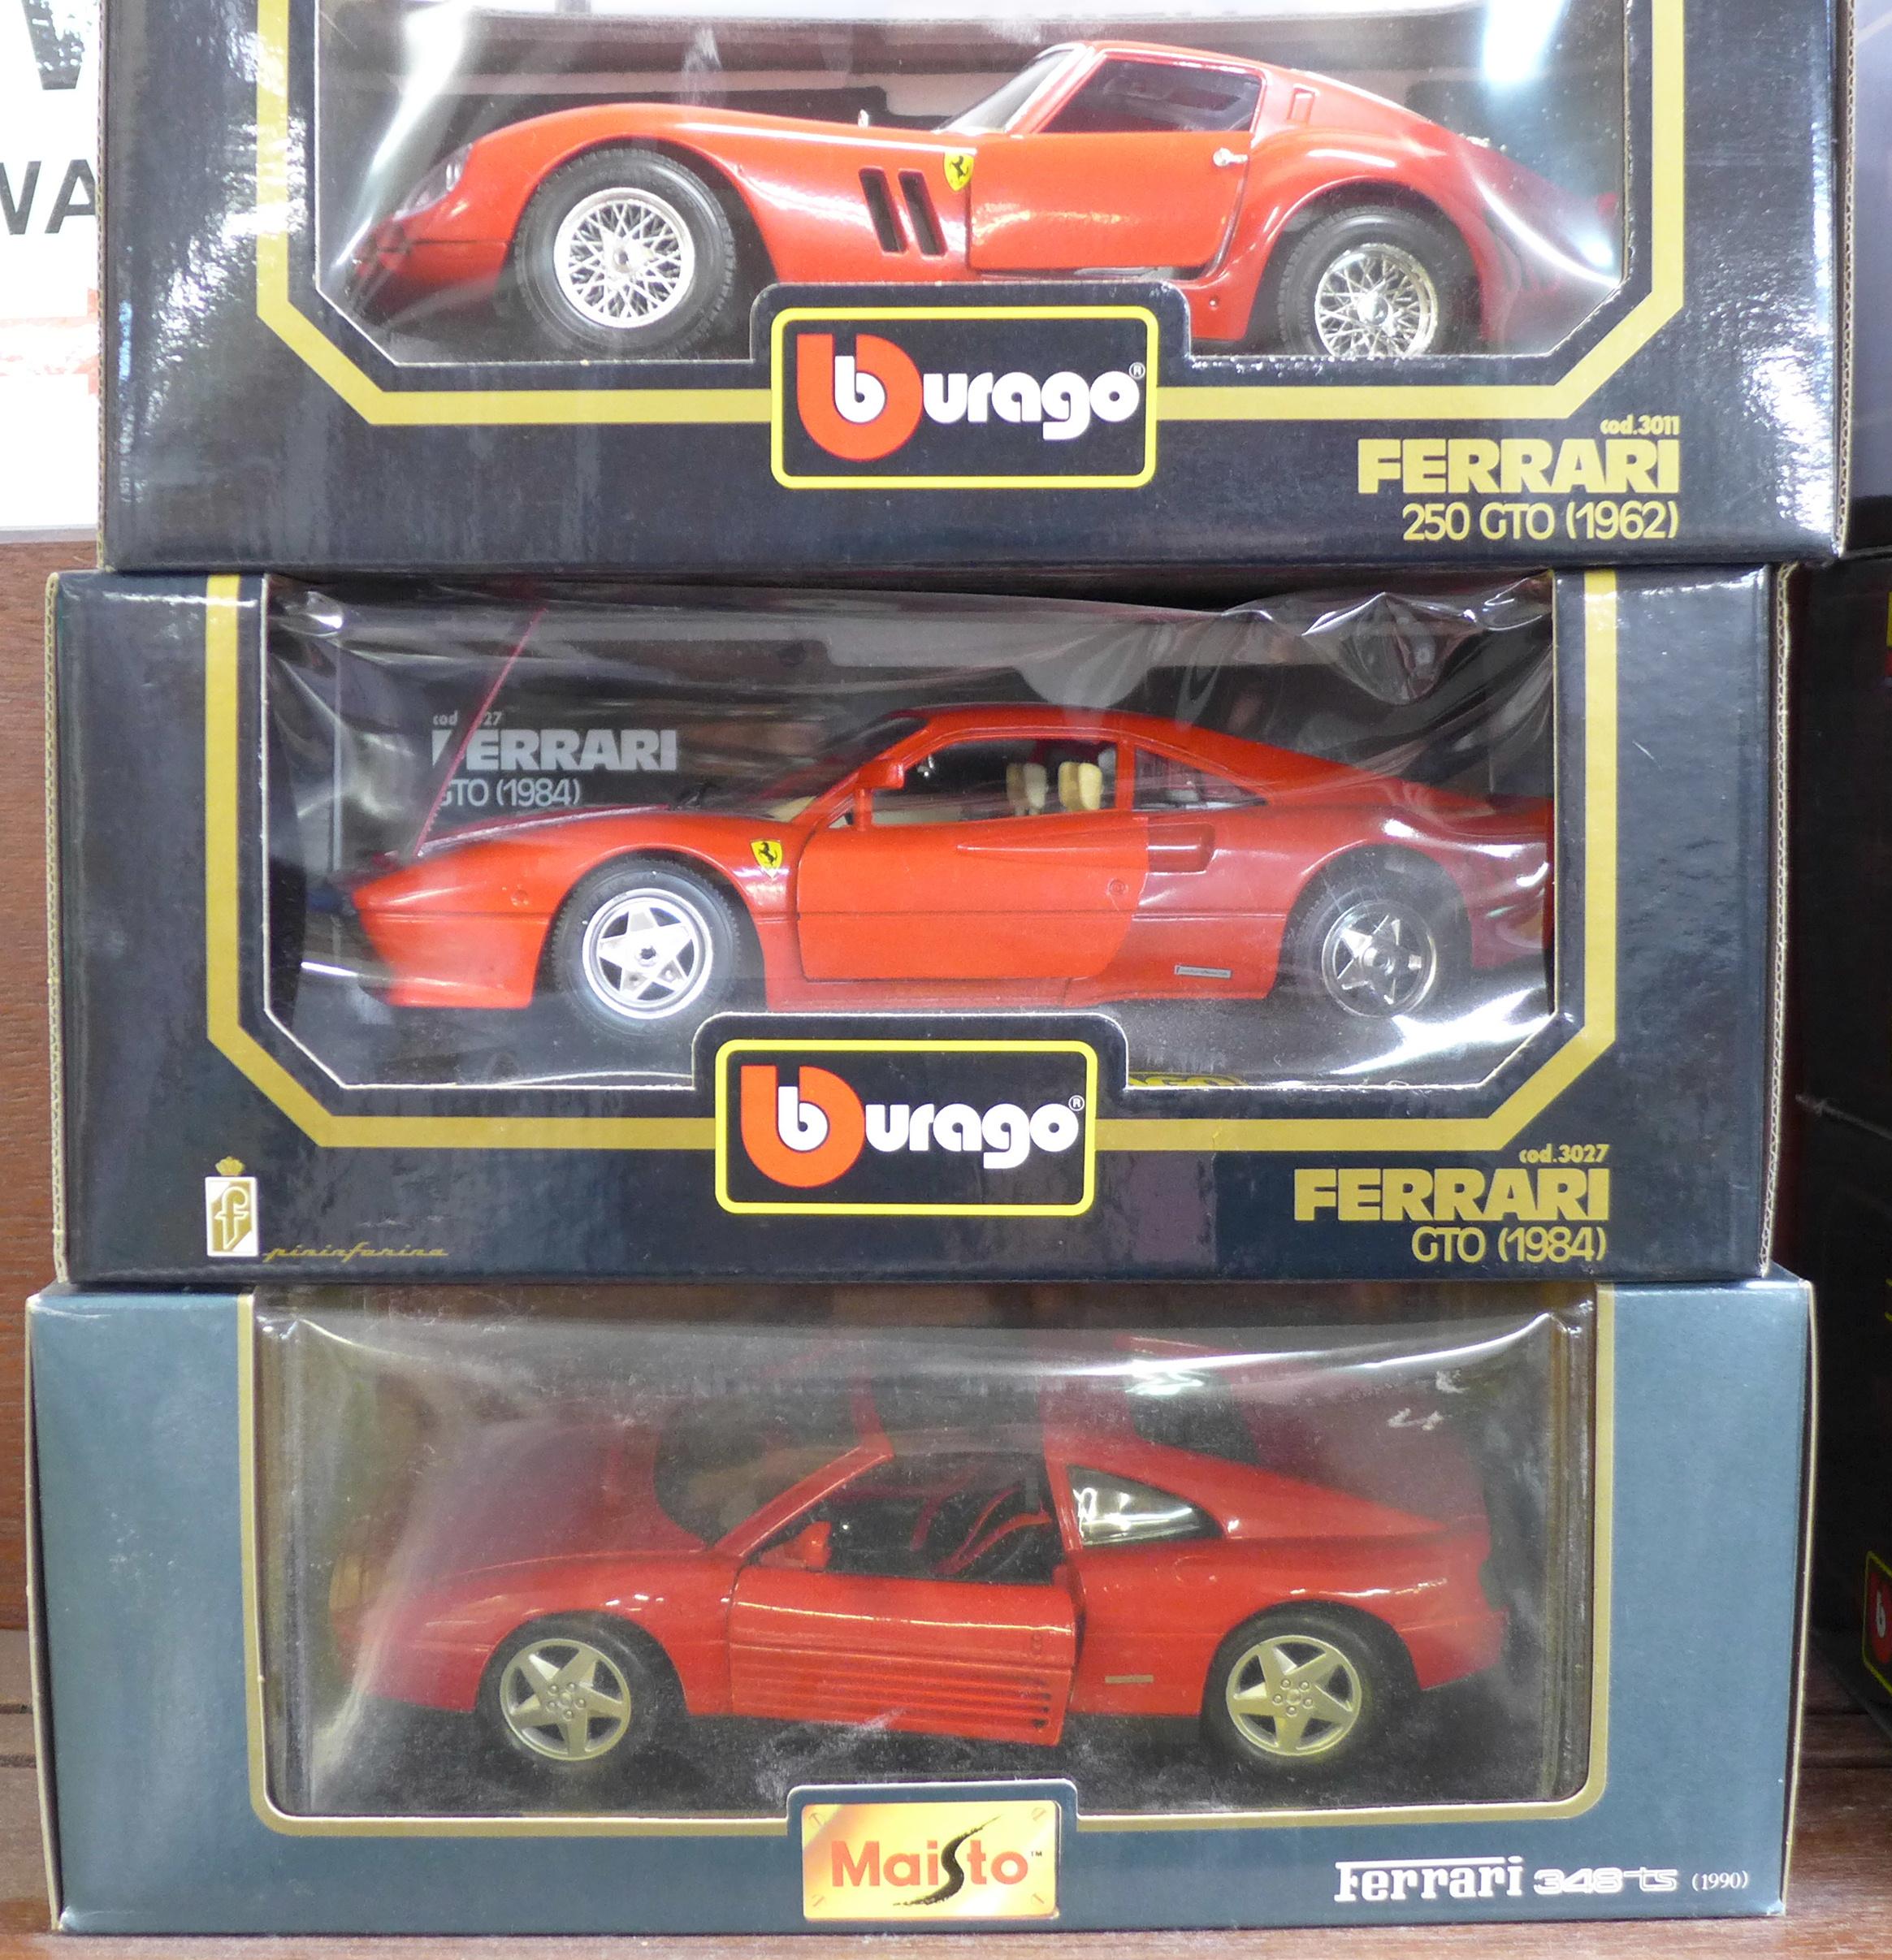 Lot 601 - Two Burago Ferrari models, 1984 GTO, 250 GTO 1962 and a Maisto Ferrari 348 TS, 1990,